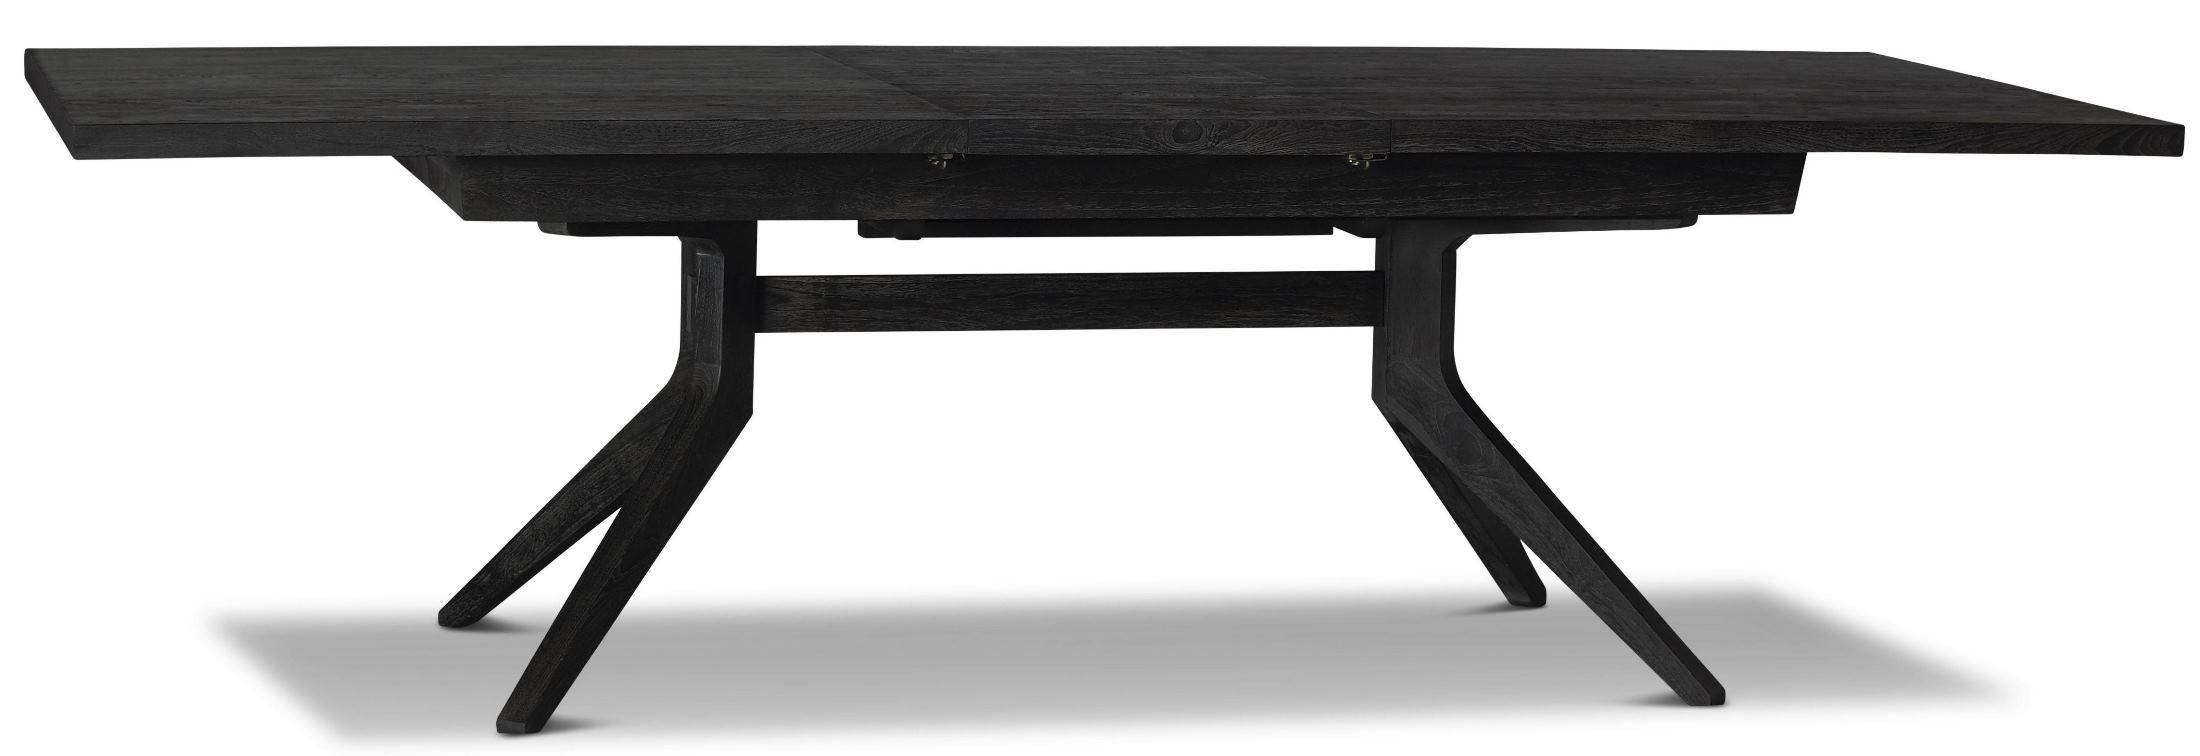 Palmer Rectangular Extendable Trestle Dining Table BRS  : plm303moderntrestletable from colemanfurniture.com size 2200 x 756 jpeg 122kB